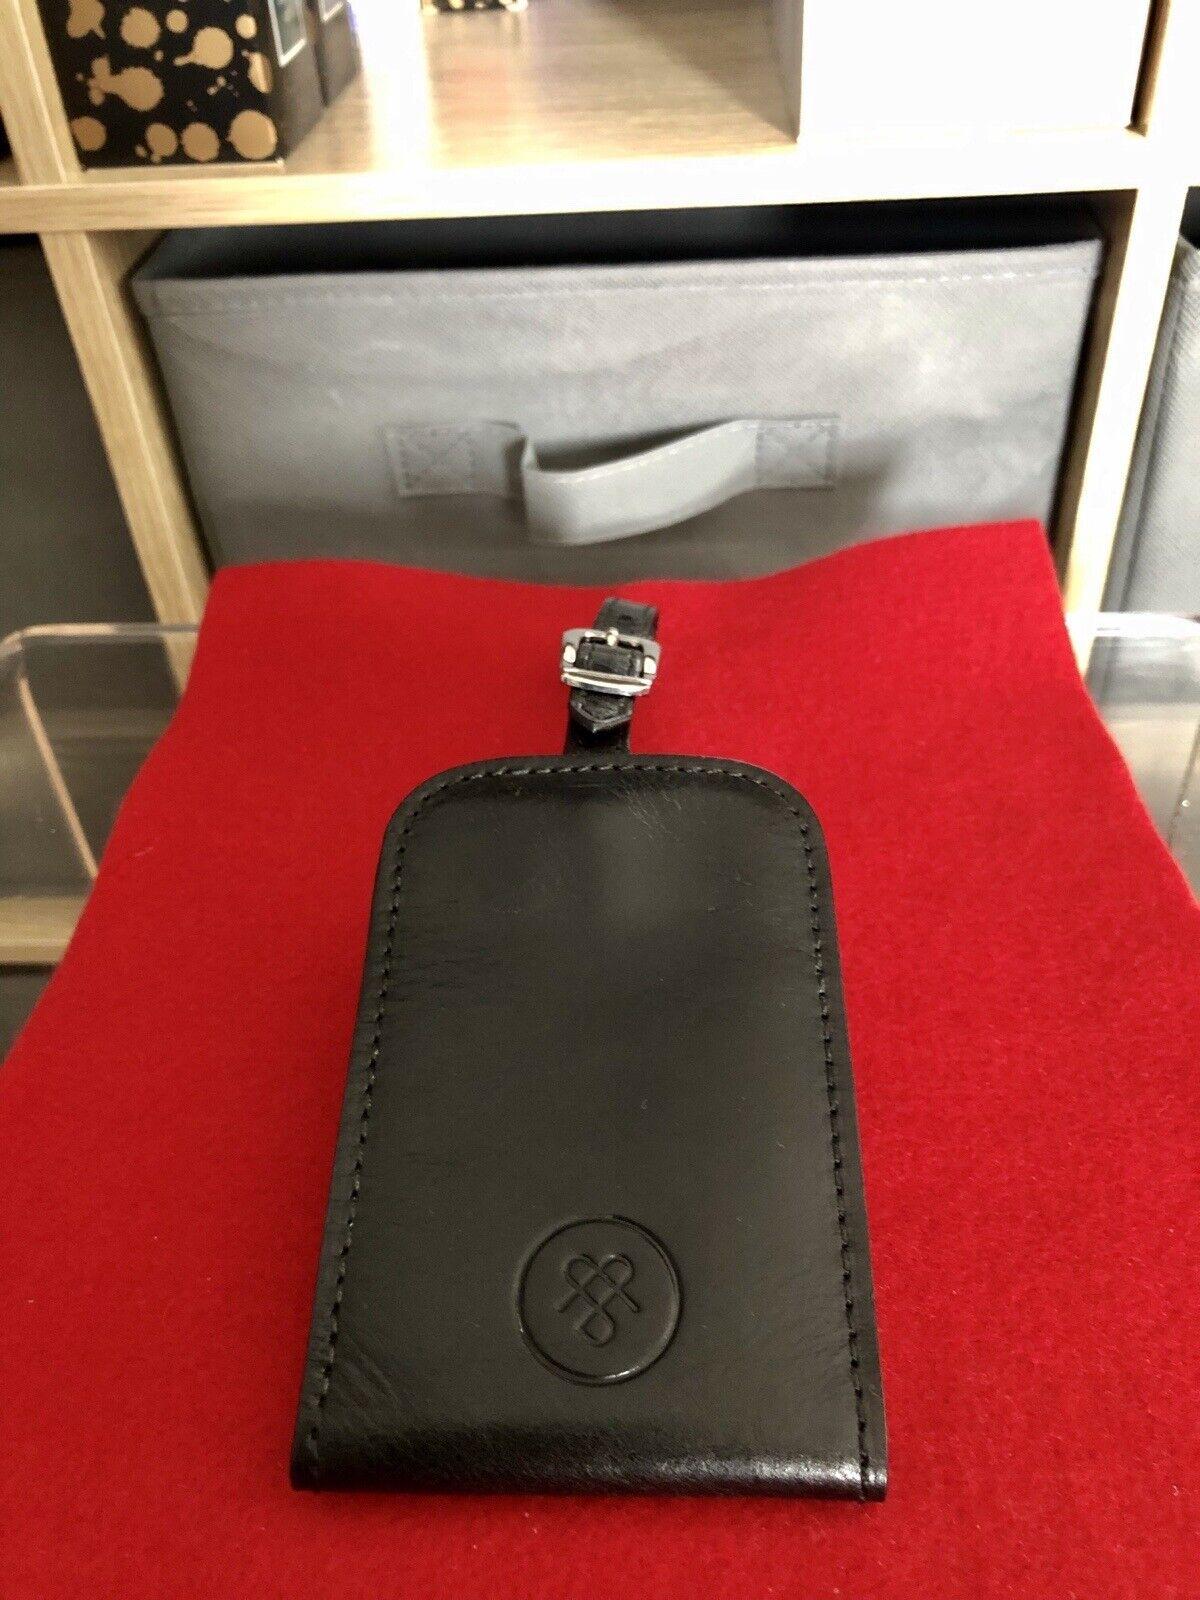 Black Maxwell Scott Ledro, Italian Handcrafted - Full Grain Leather luggage Tag.